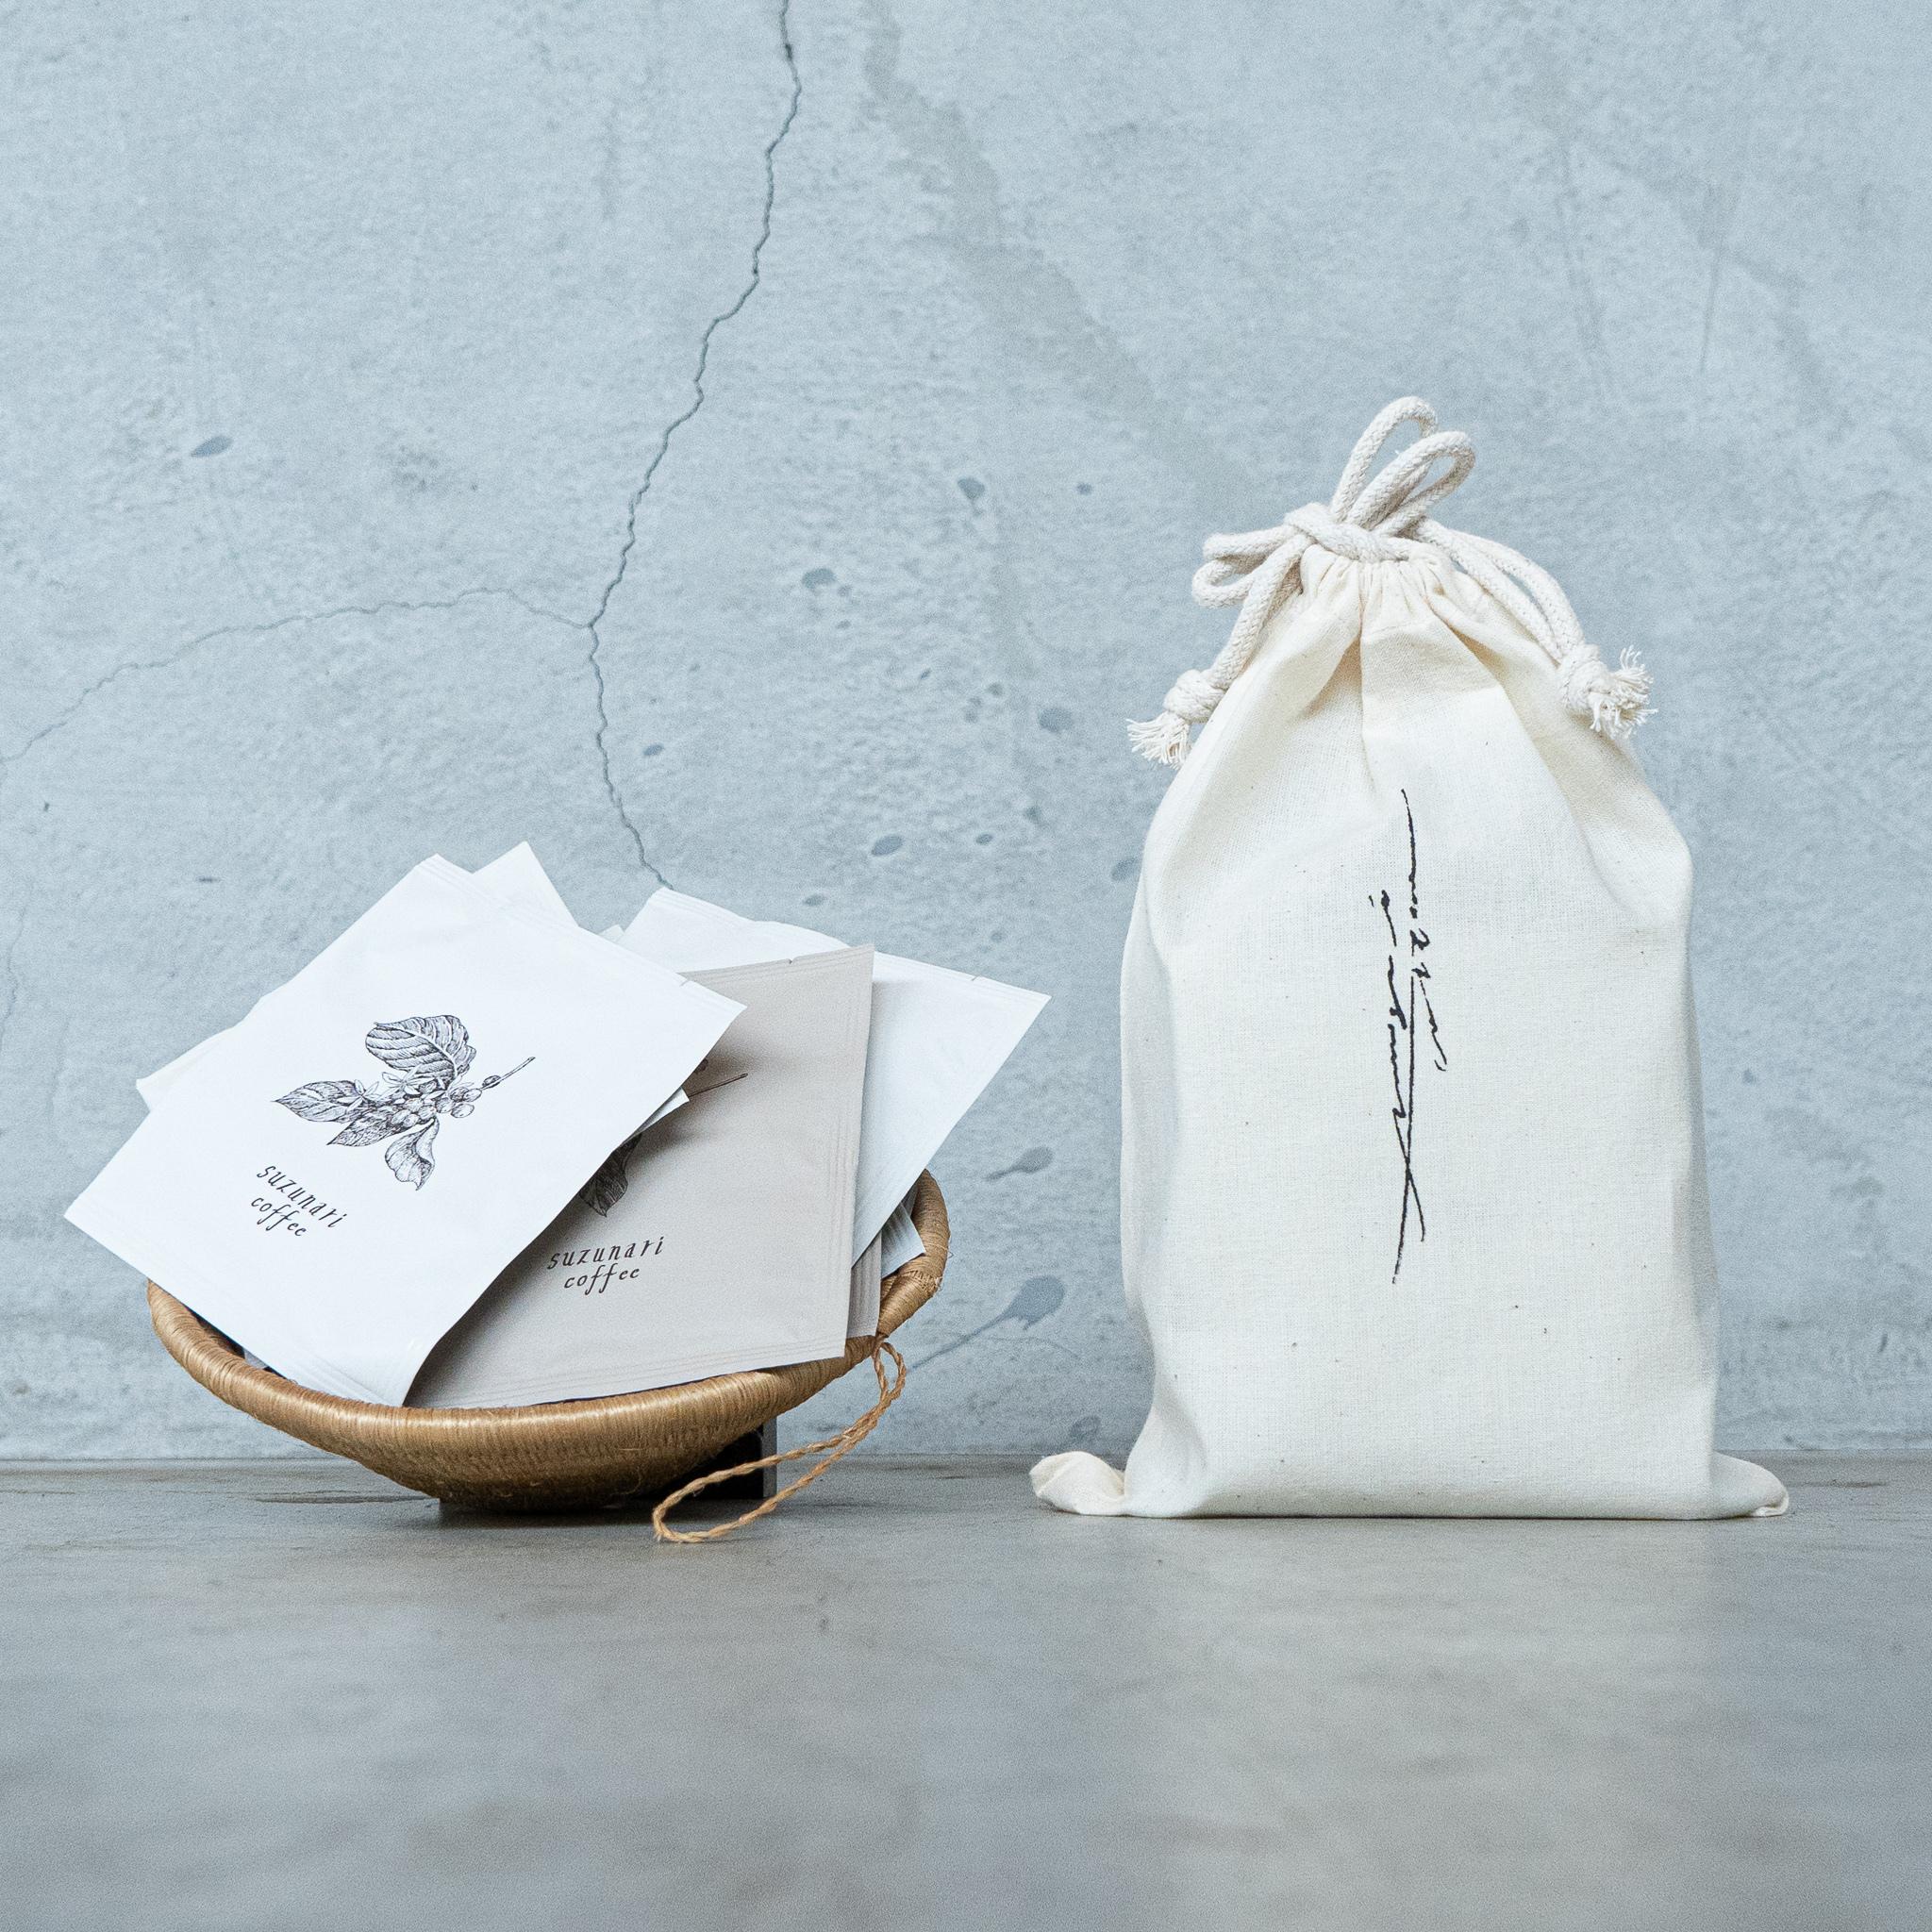 suzunari coffee Drip Bag 10個セット